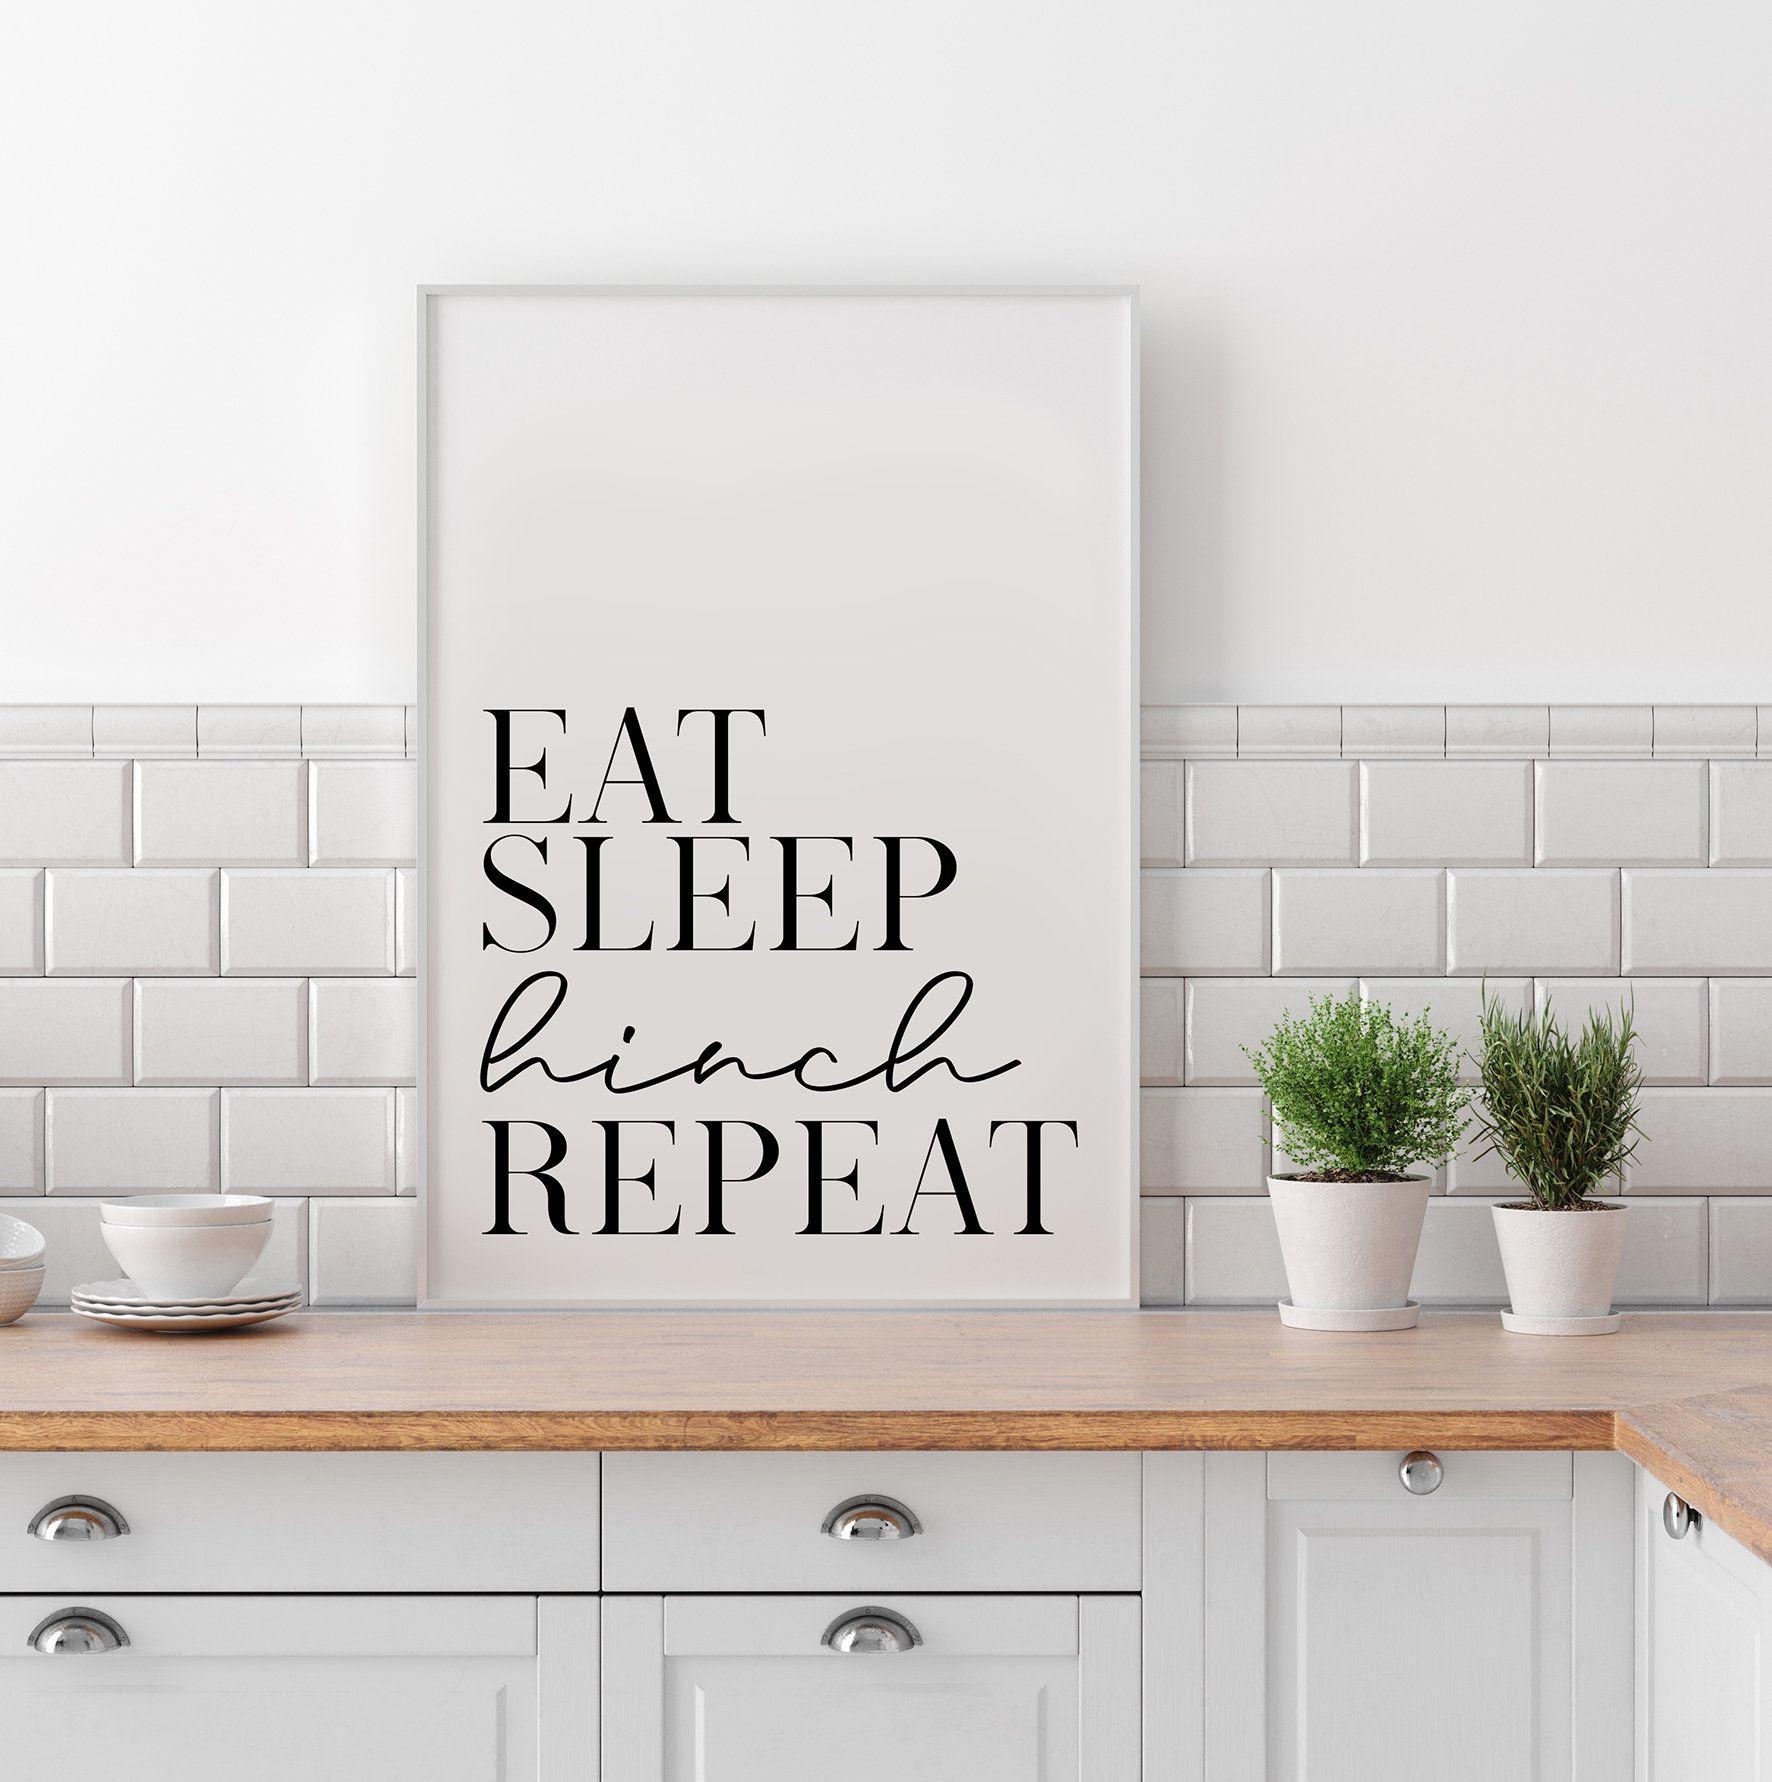 Eat Sleep Hinch Repeat Print Mrs Hinch Print Mrs Hinch Home Home Print Kitchen Print Bathroom Print Cleaning Print Hincher Hinching In 2020 Kitchen Decor Etsy Kitchen Decor Kitchen Prints